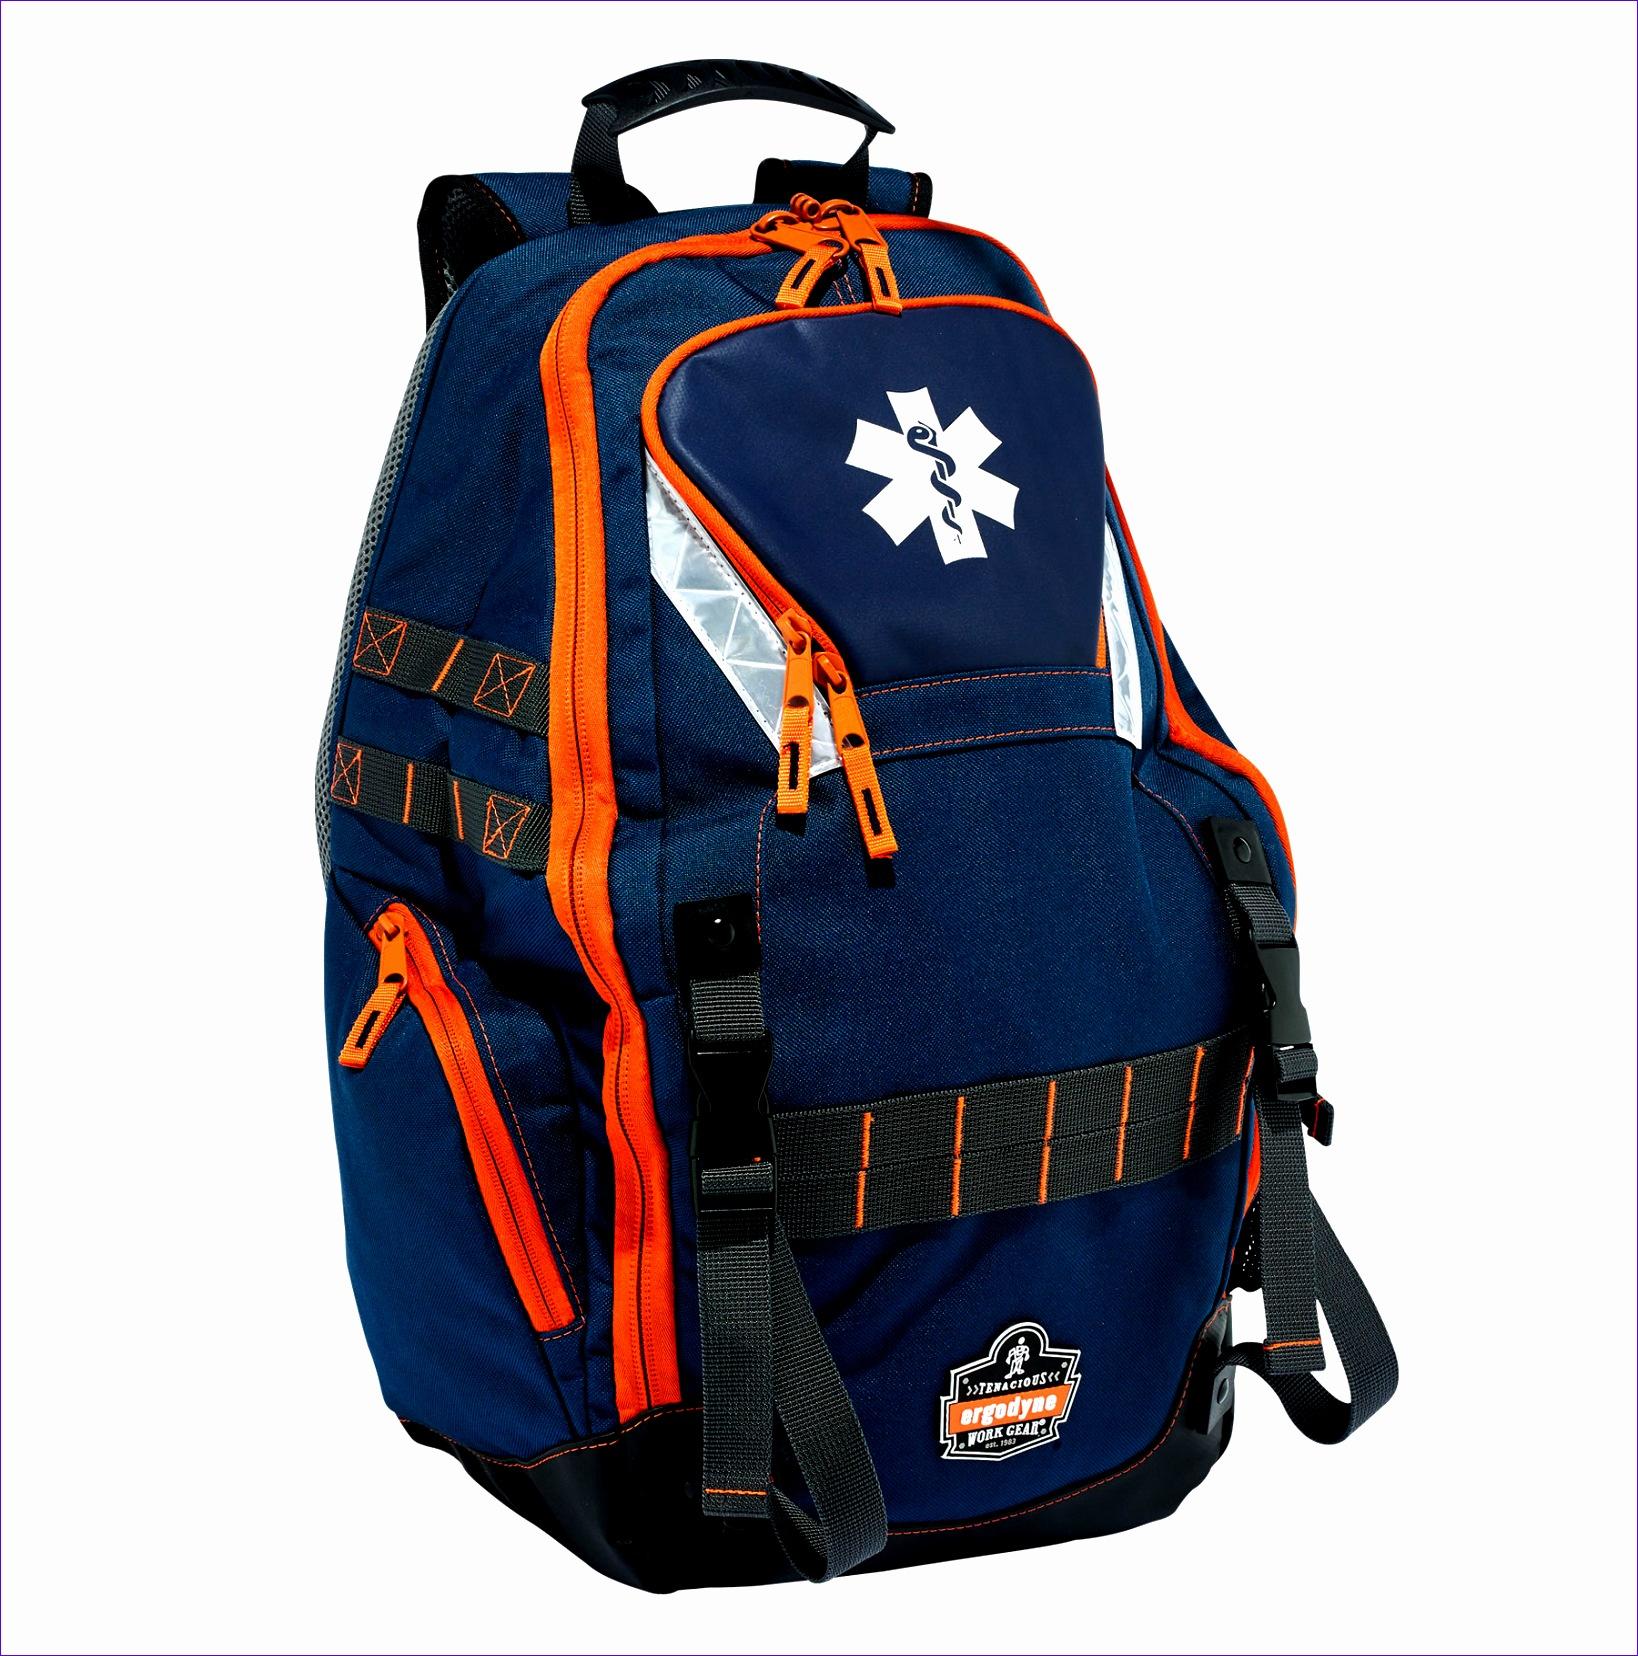 arsenal 5244 responder backpack